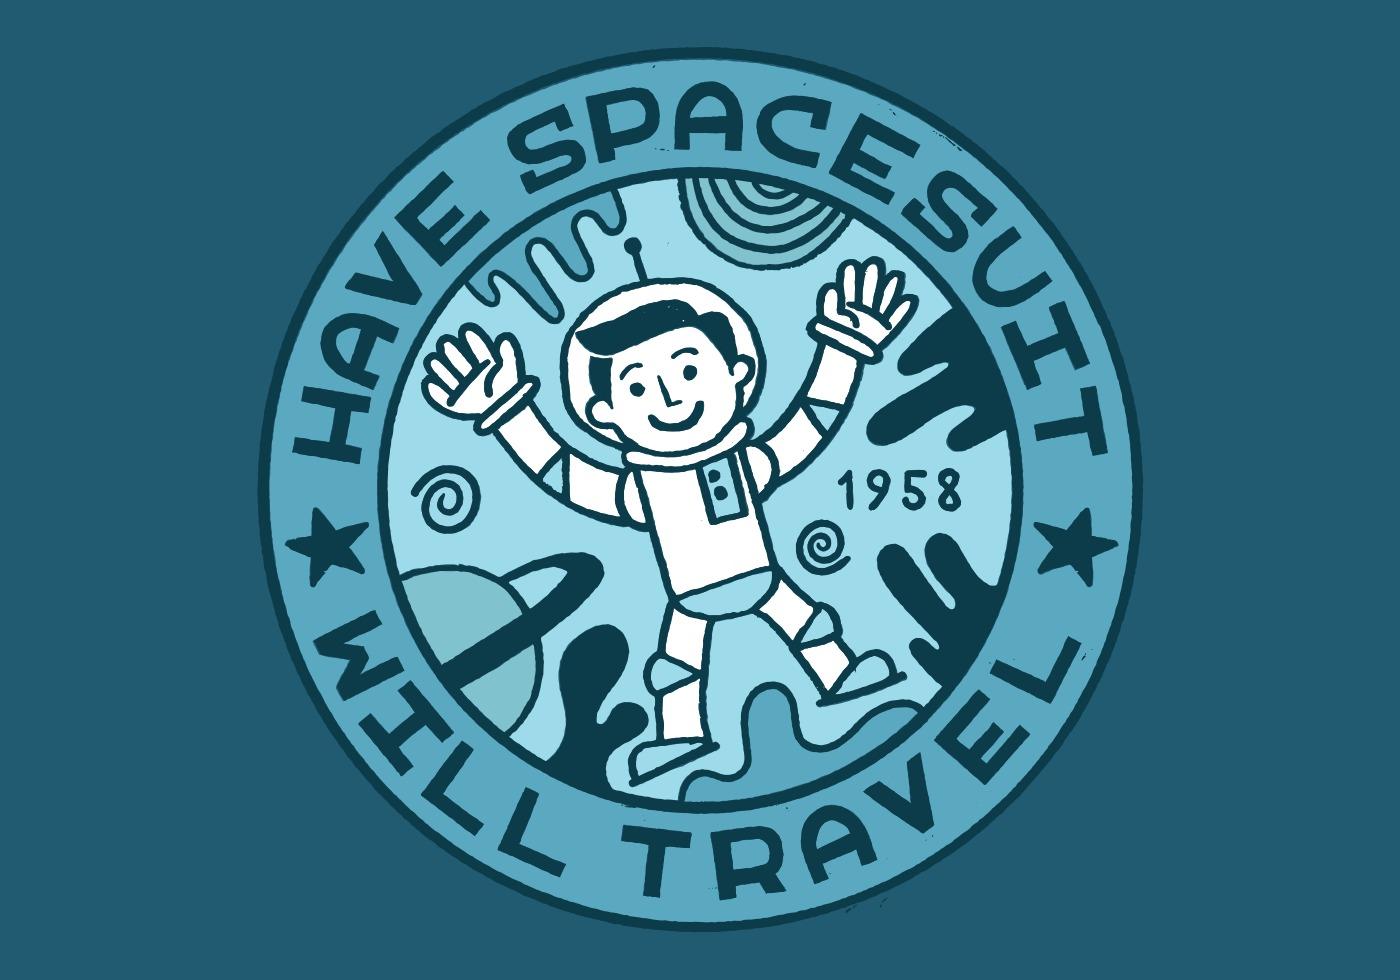 space man merit badge - Download Free Vector Art, Stock ...